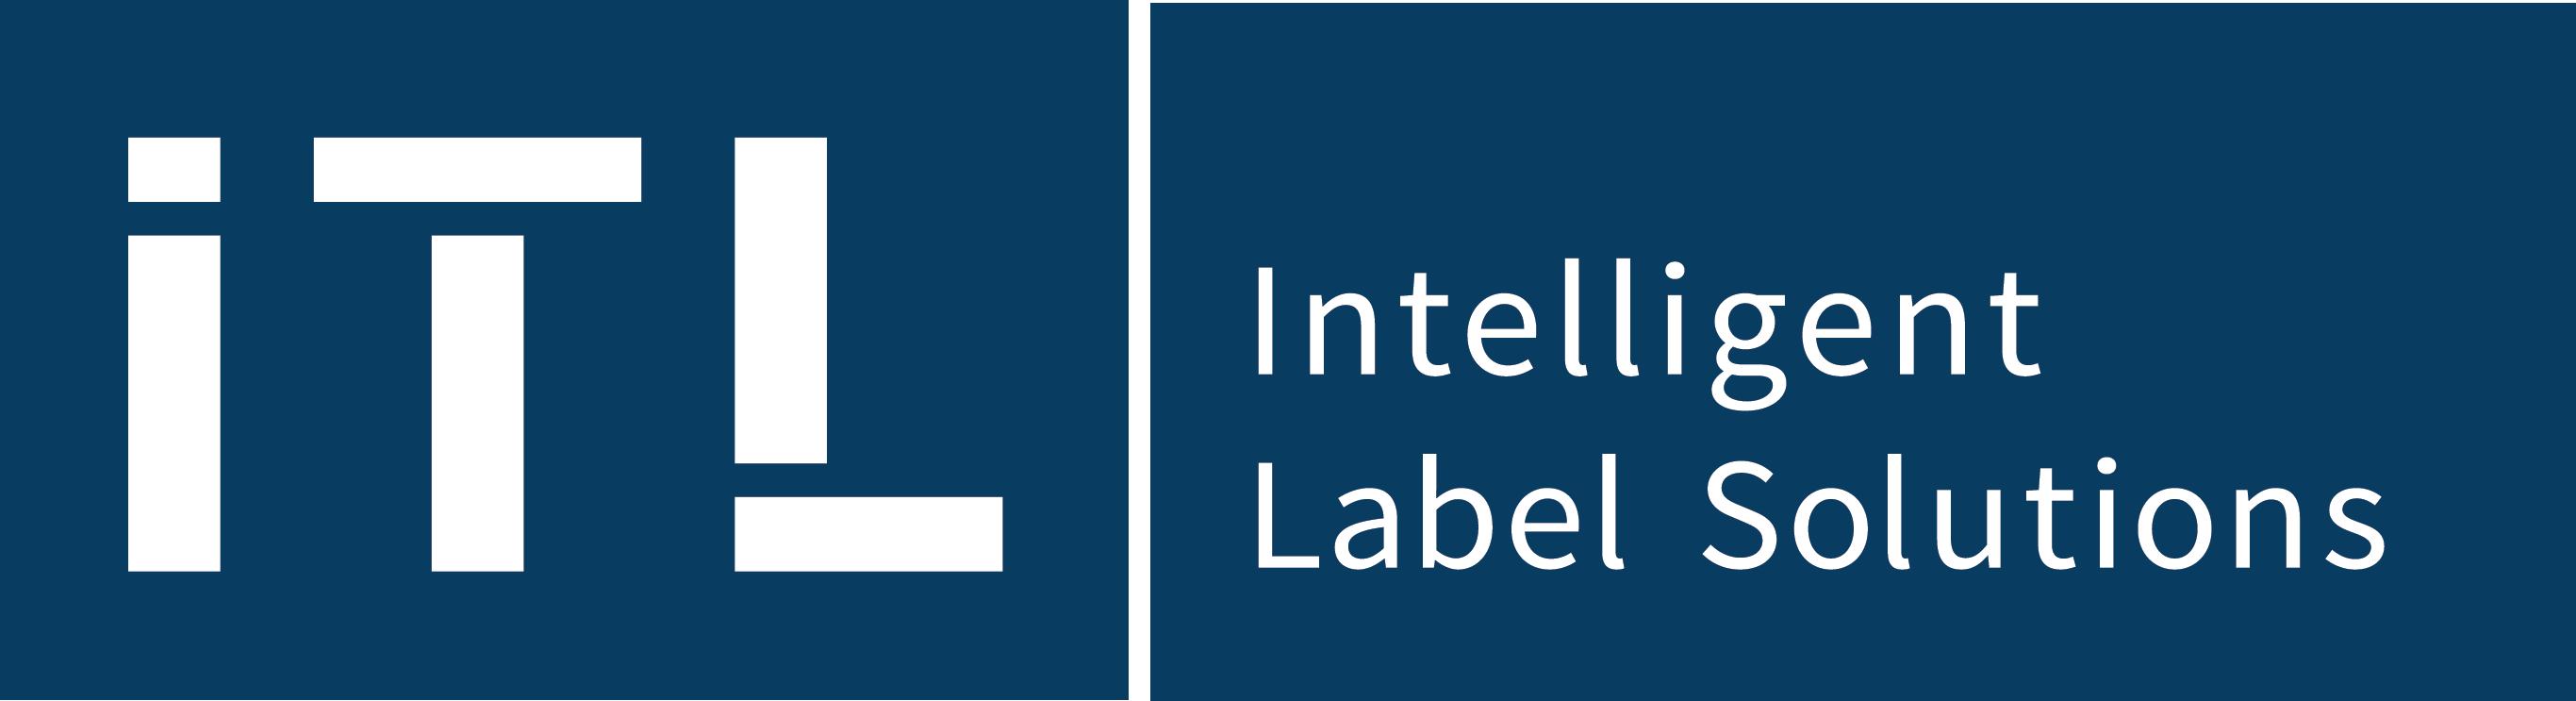 ITL - Intelligent Label Solutions